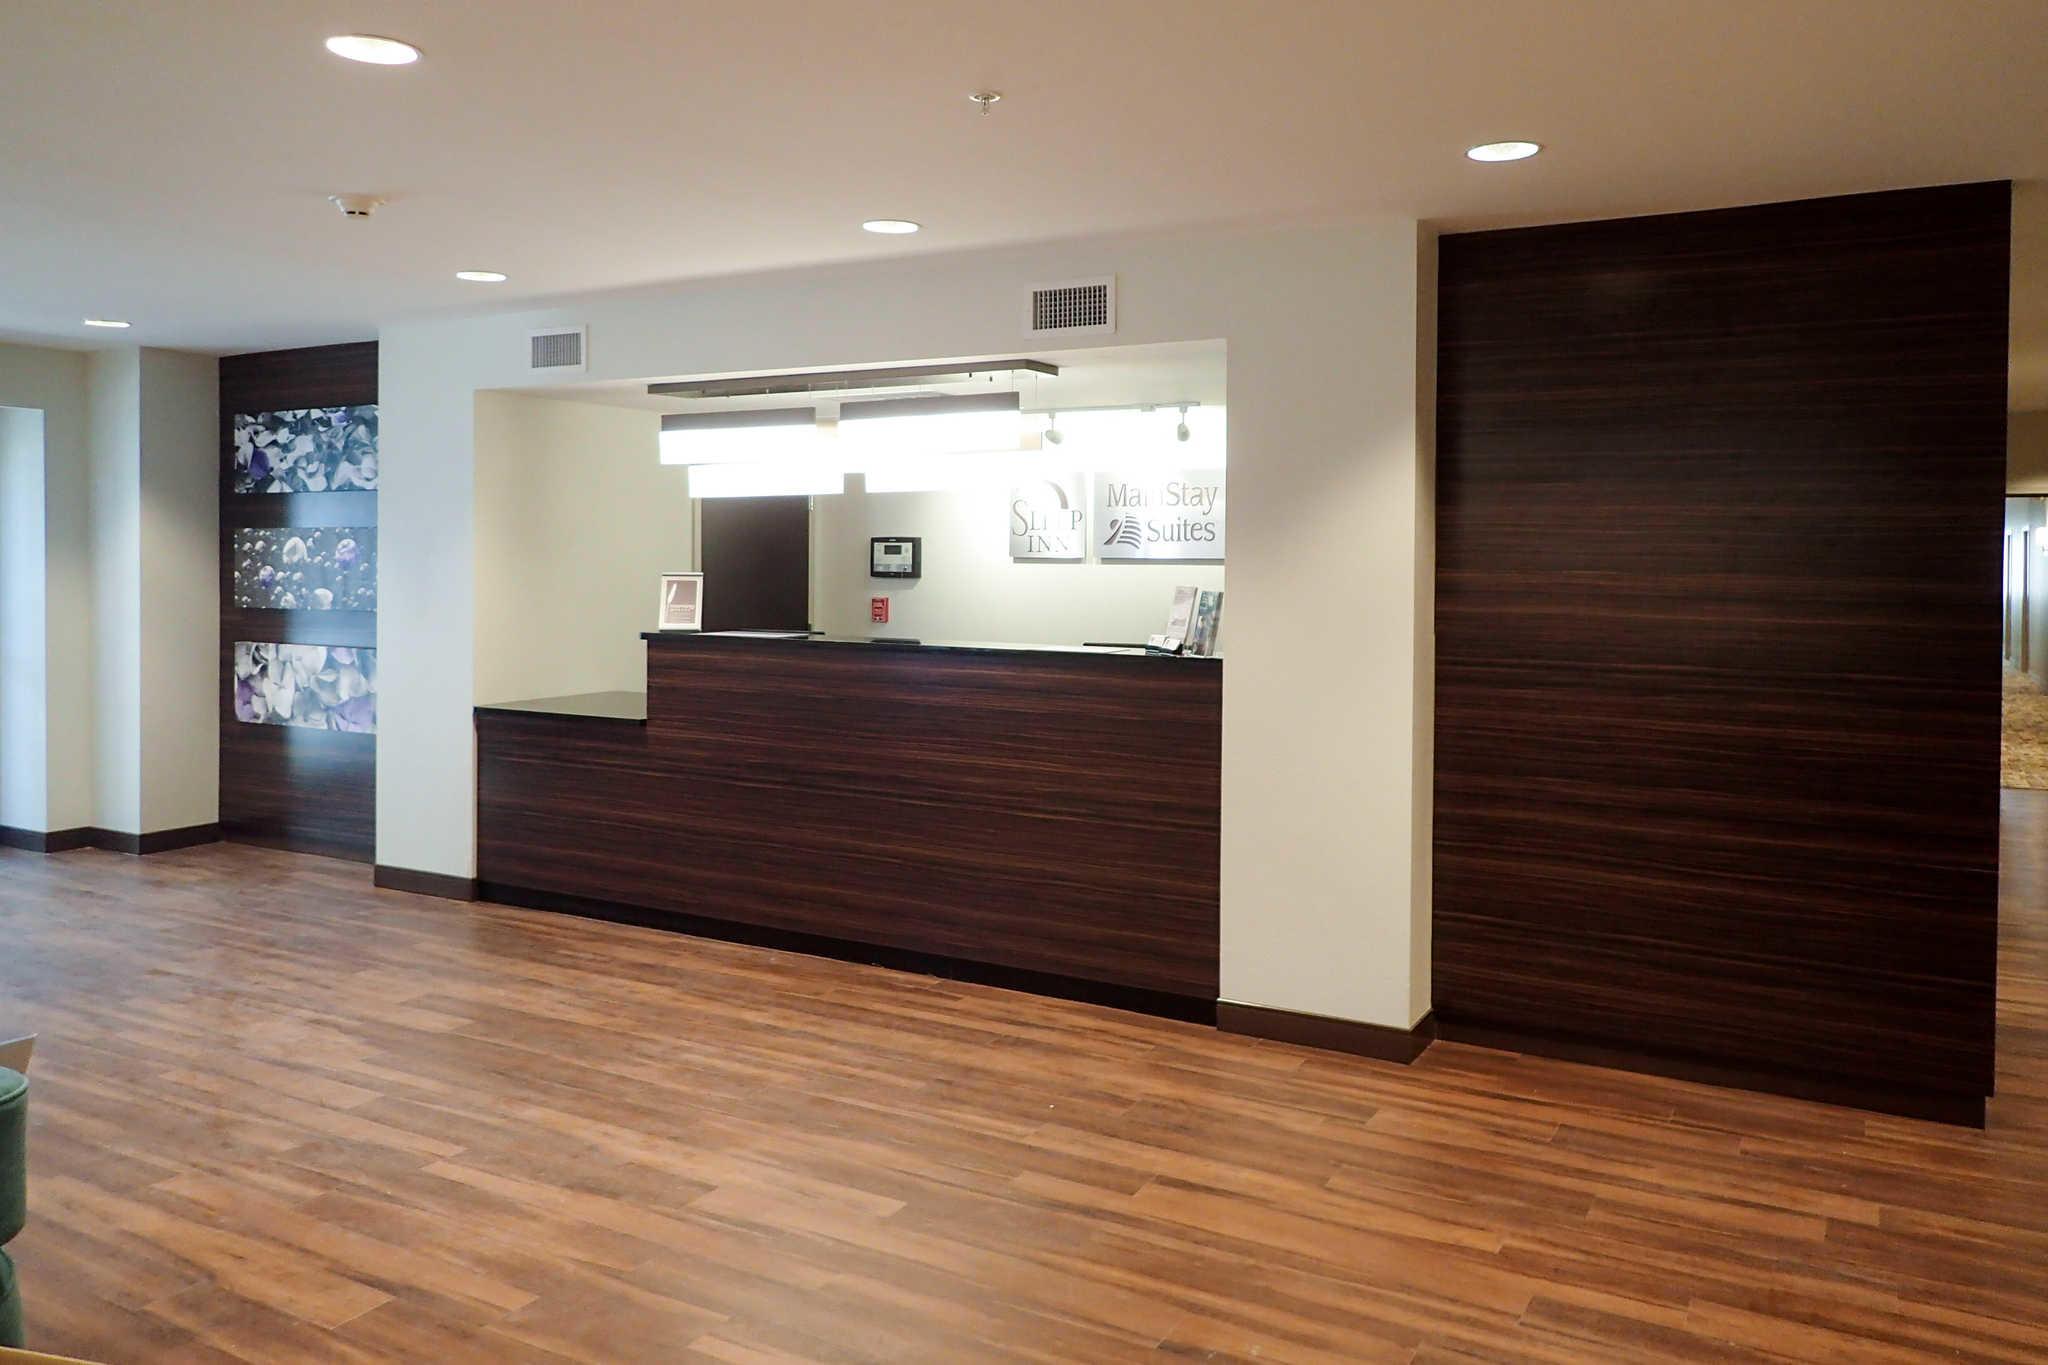 MainStay Suites St. Louis - Airport image 2